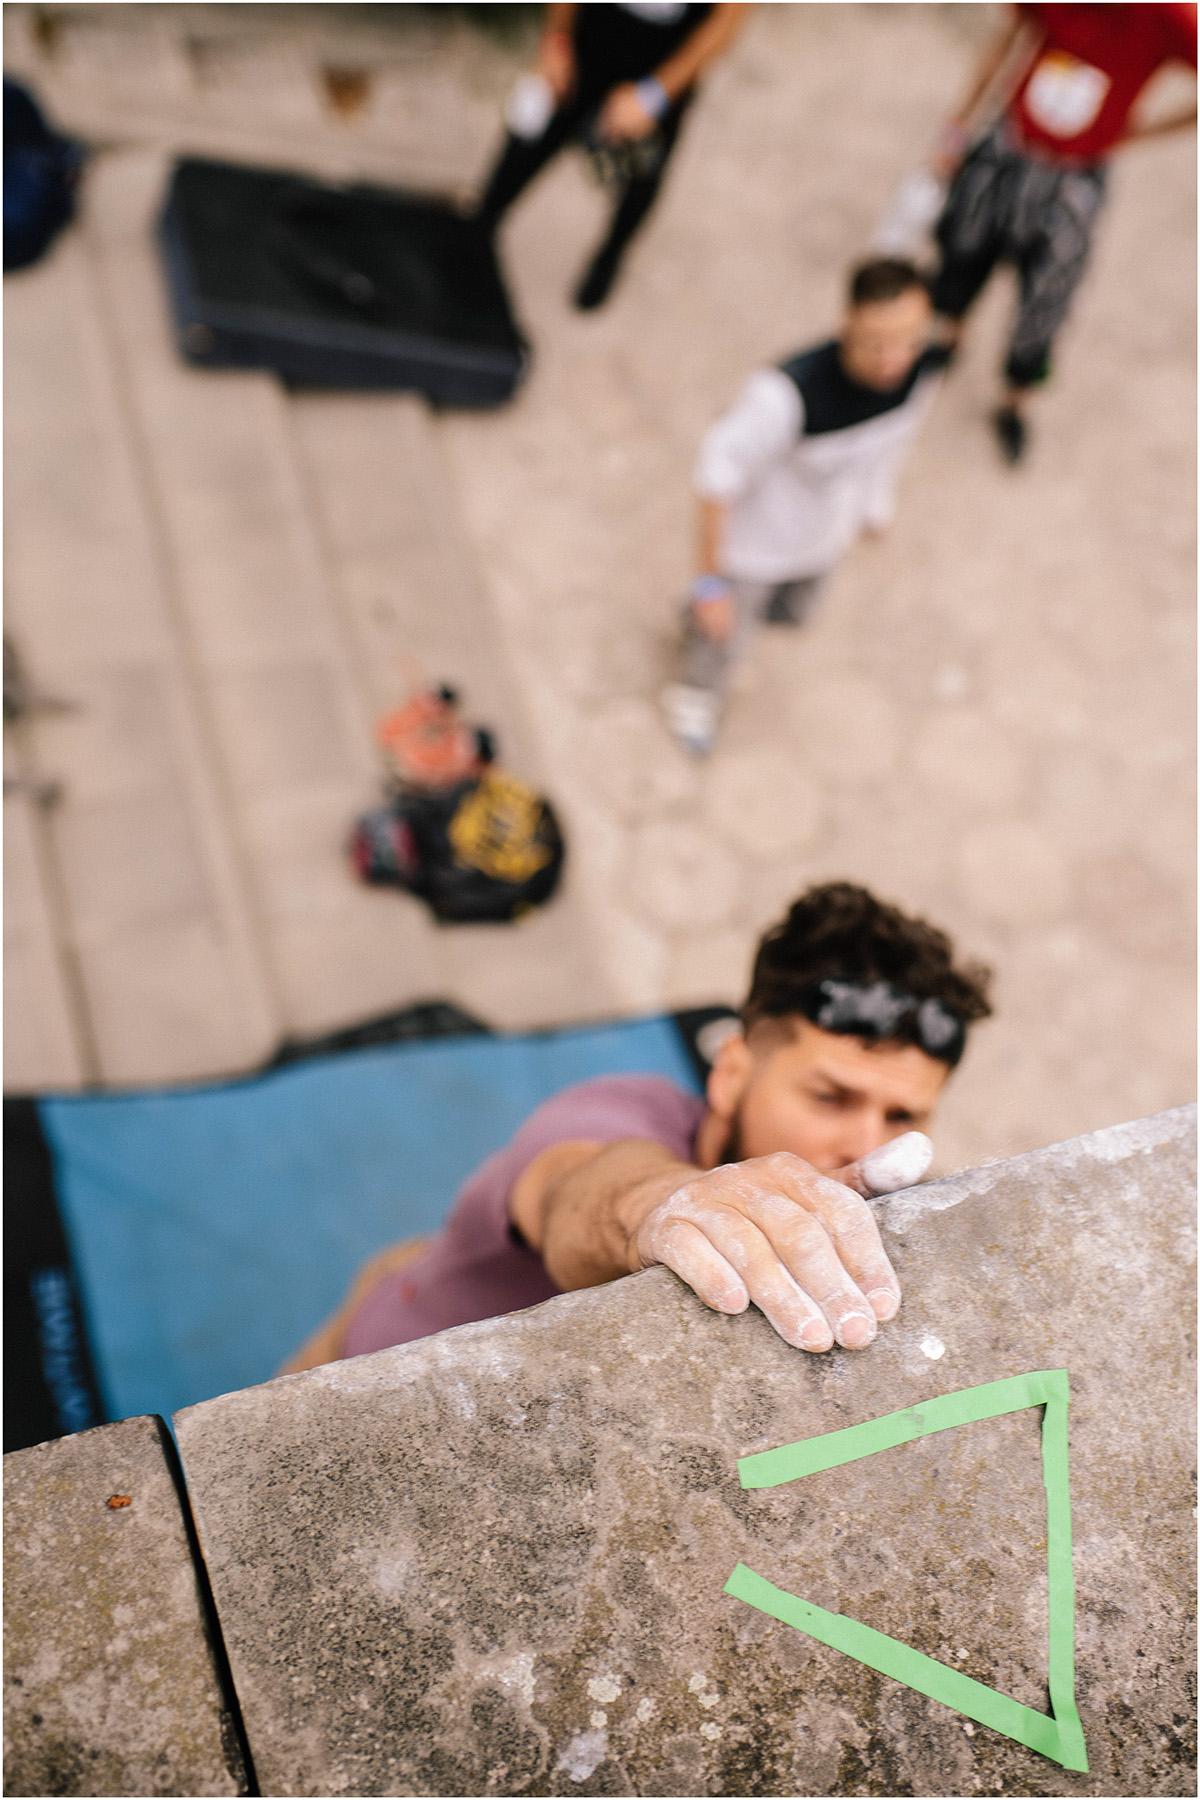 KSF #4 Urban climbing 28